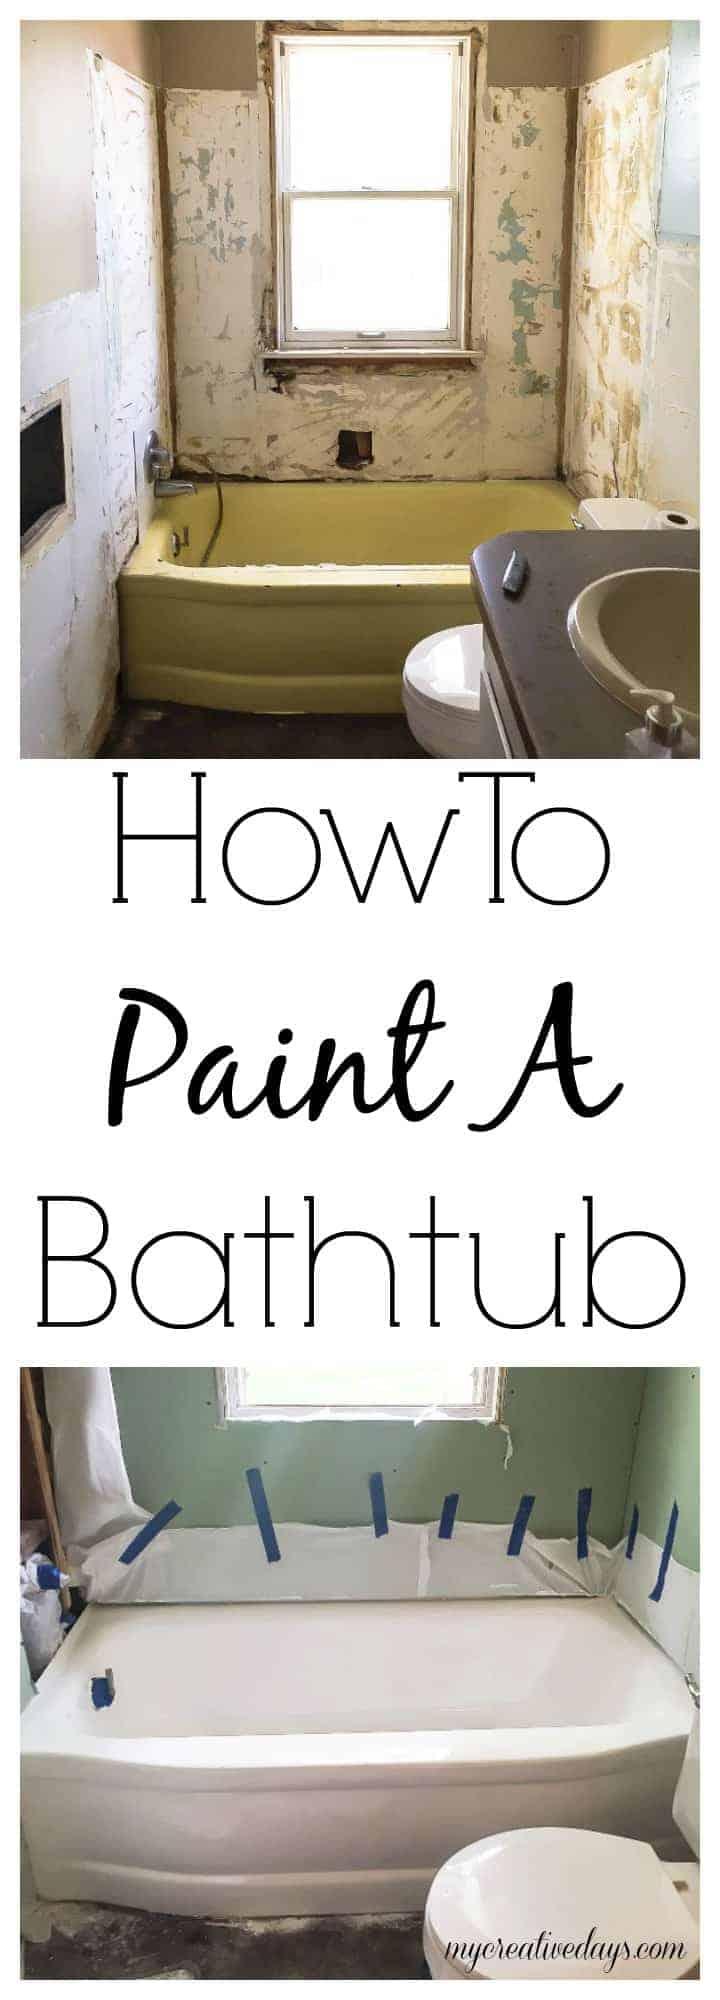 Cute How To Paint Tub Tiny Bathtub Glaze Rectangular Resurface Bathtub Cost Cost To Reglaze A Tub Youthful Glaze Tub RedBathroom Glazing How To Paint A Bathtub   Cintinel